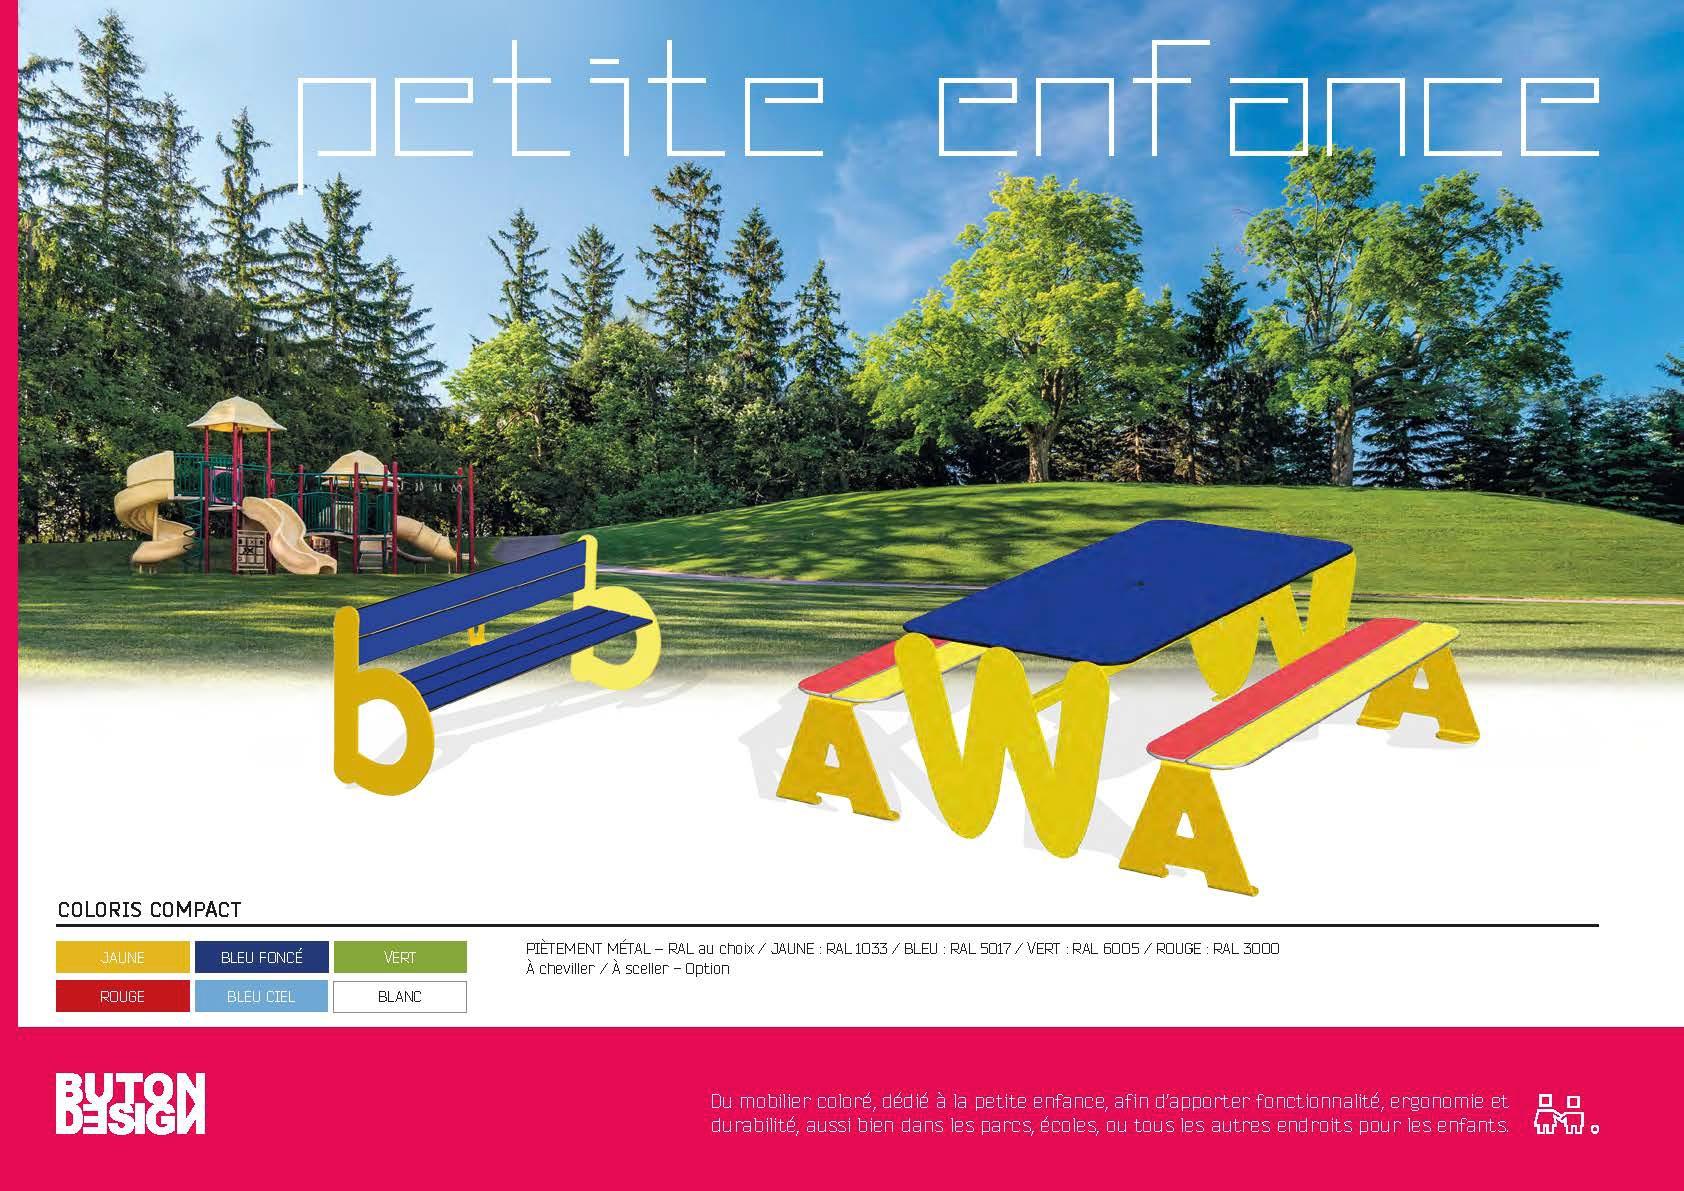 f736620e19 Buton Design - Catalogue - English version